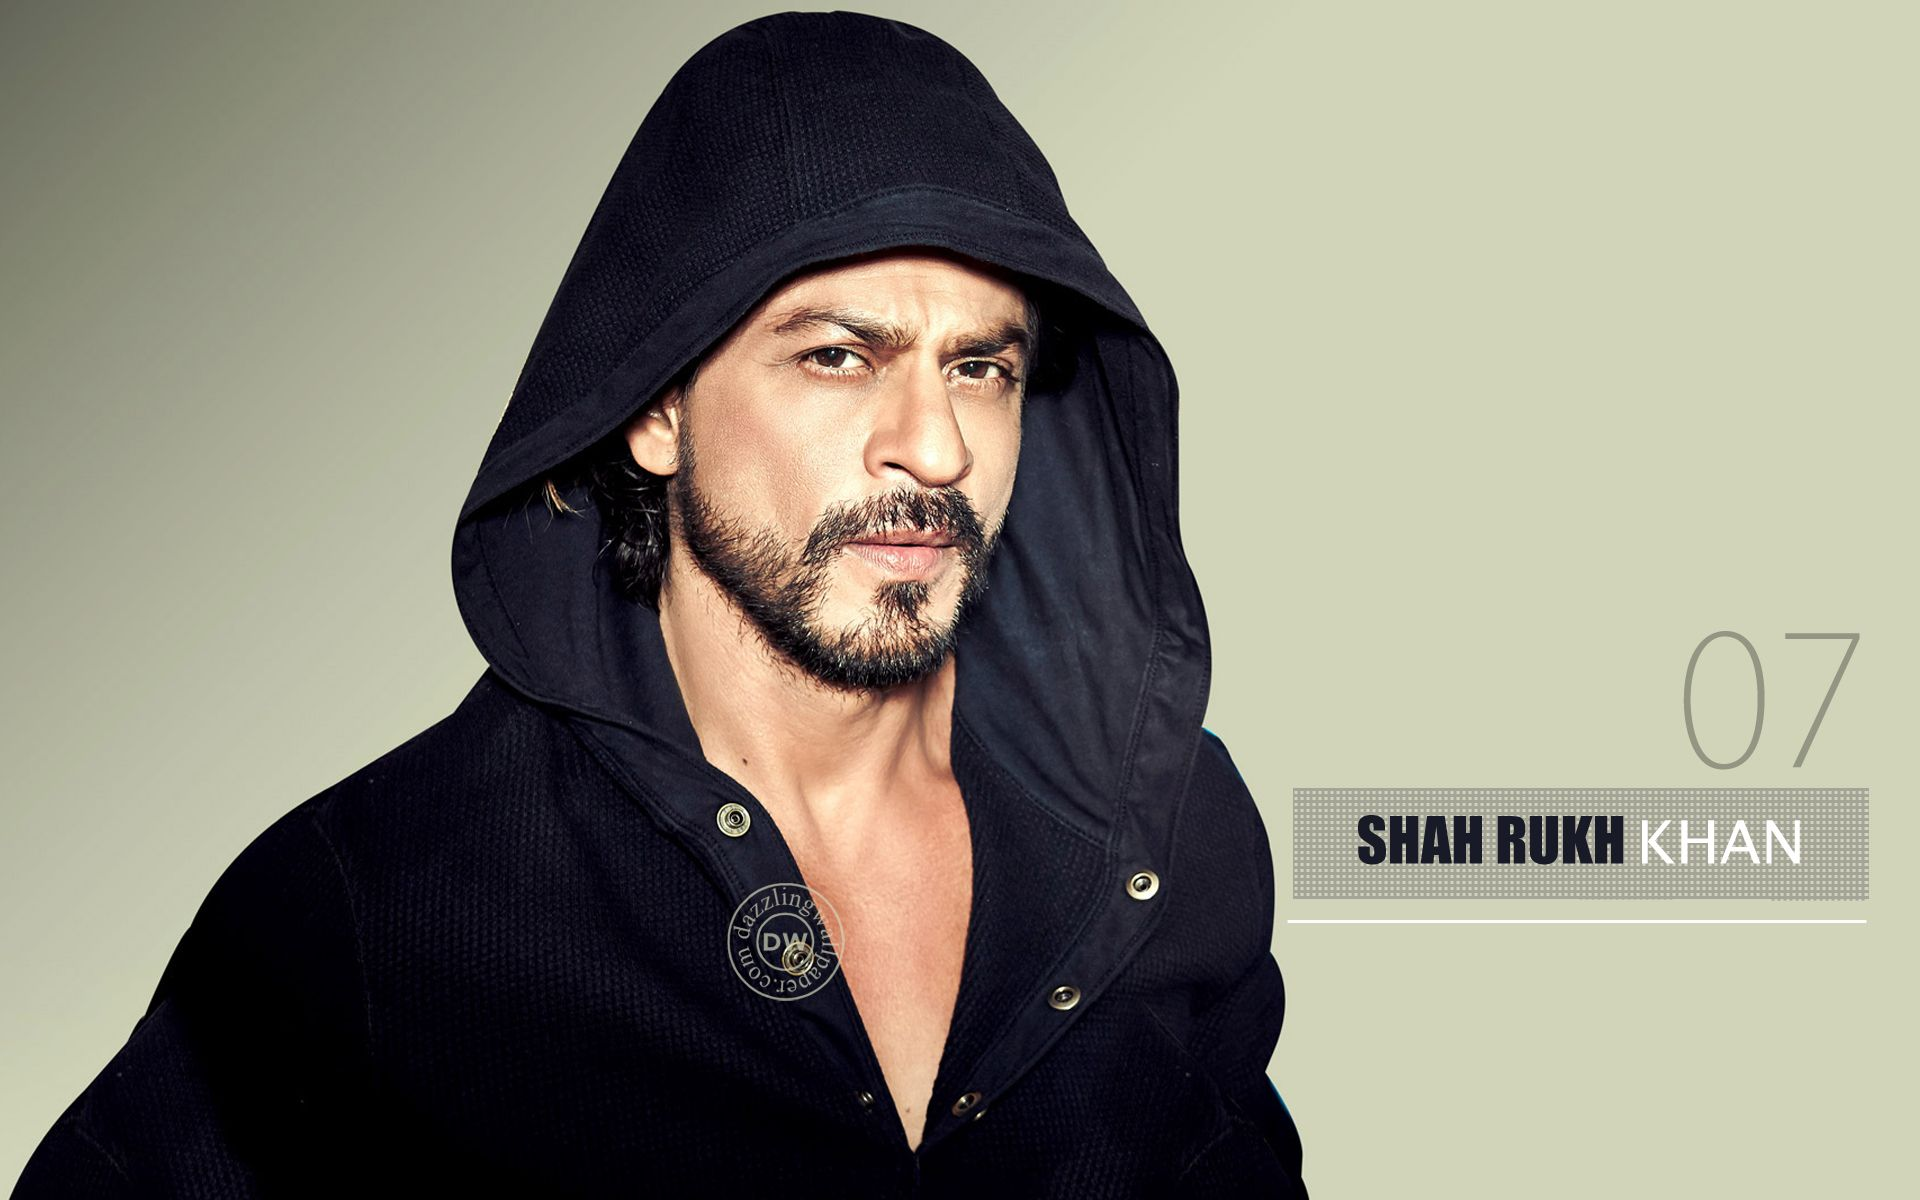 Wallpaper download bollywood actors - Shah Rukh Khan Bollywood King Hd Wallpaper Shahrukh Khan Bollywood Actor Hd Wallpapers